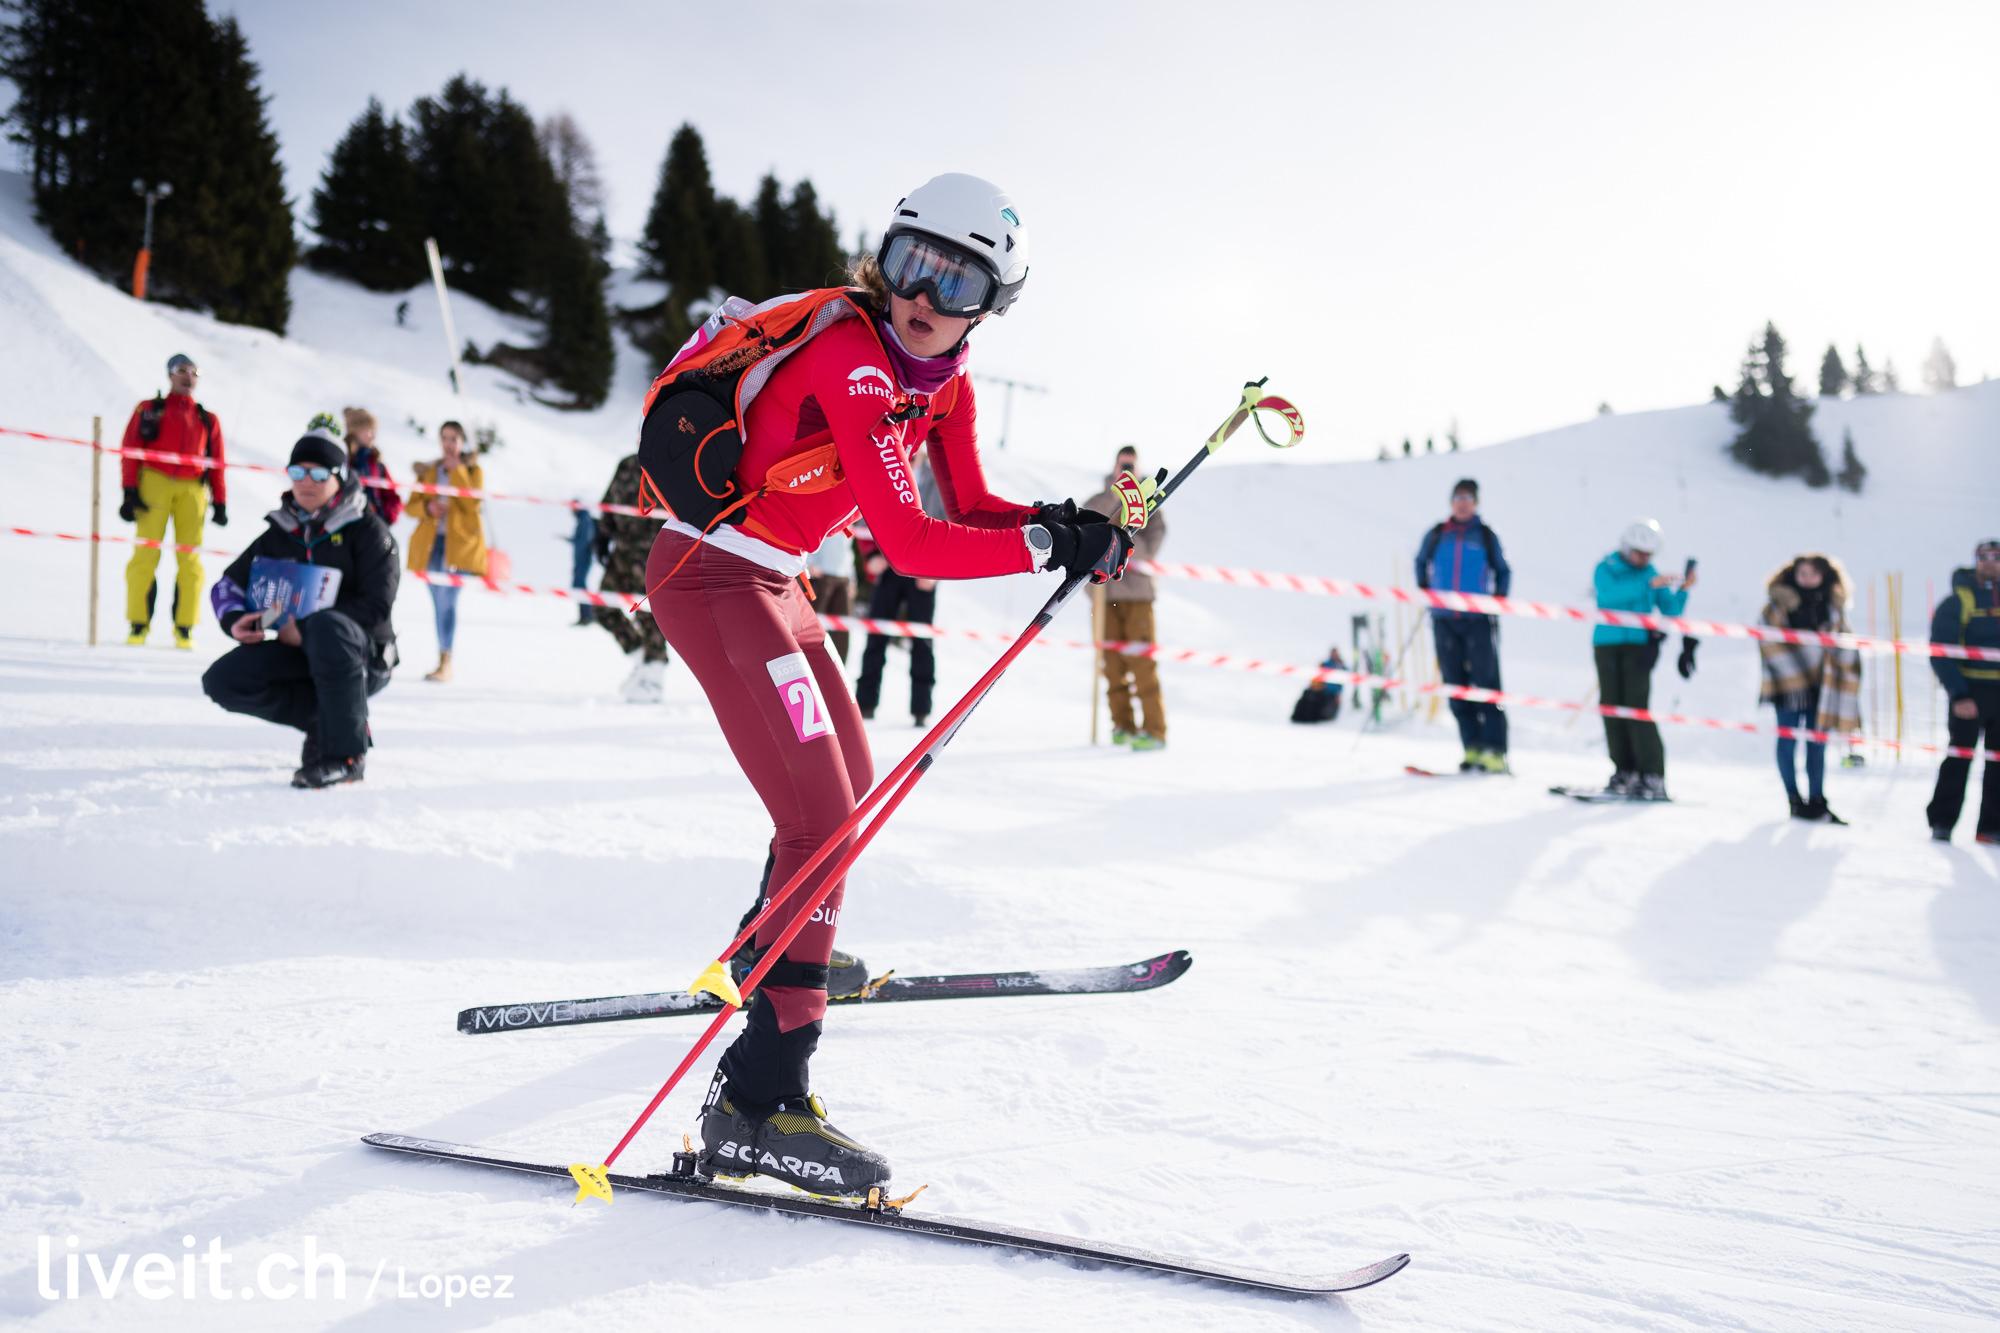 SCHWEIZ SKI MOUNTAINEERING YOUTH OLYMPIC GAMES